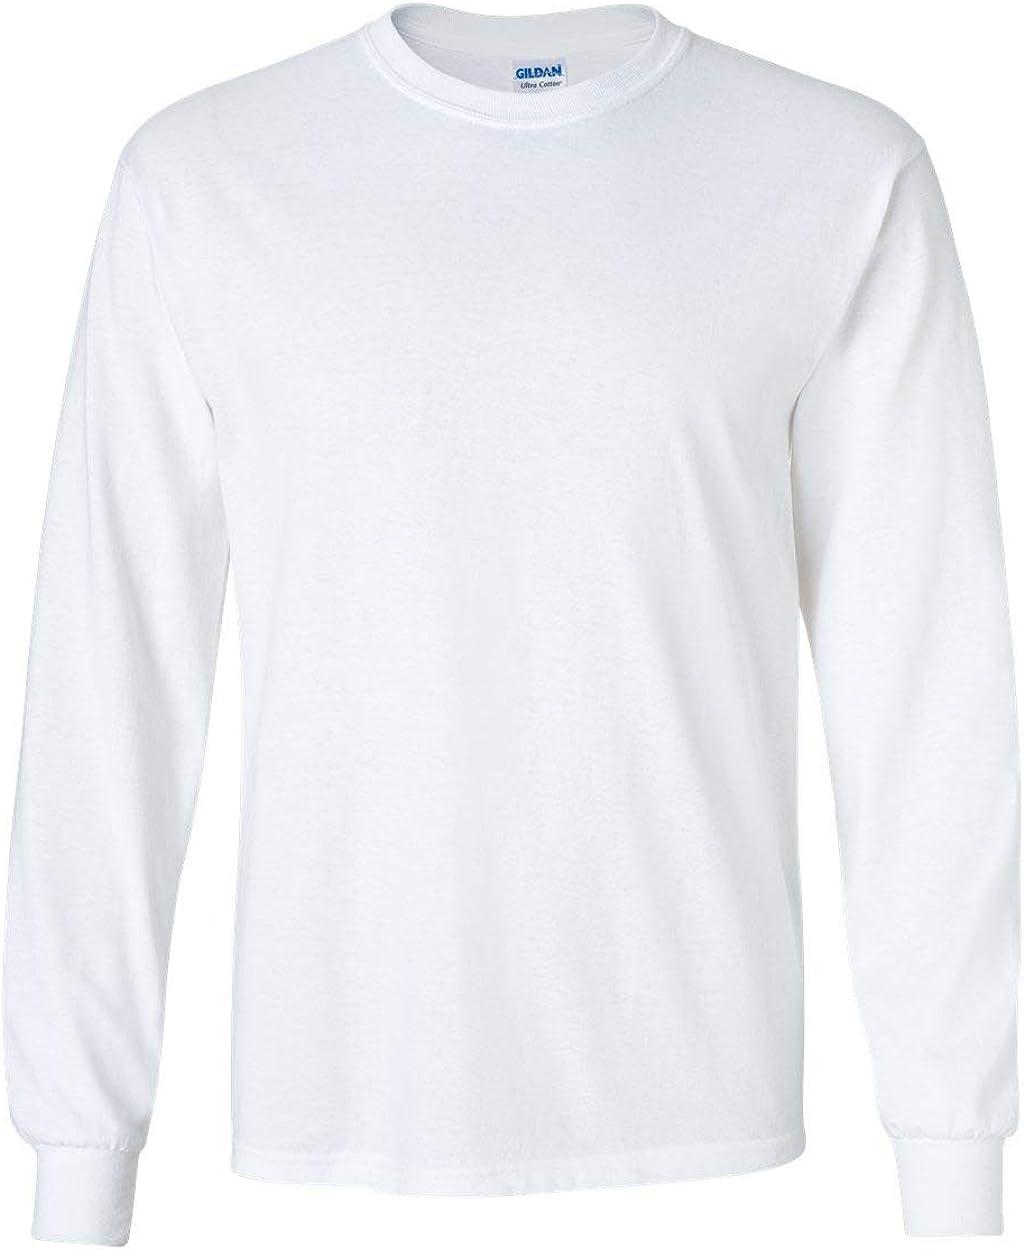 Gildan Mens Ultra Cotton Adult Long Sleeve T-Shirt Classic Fit Rib Cuffs Tee TOP